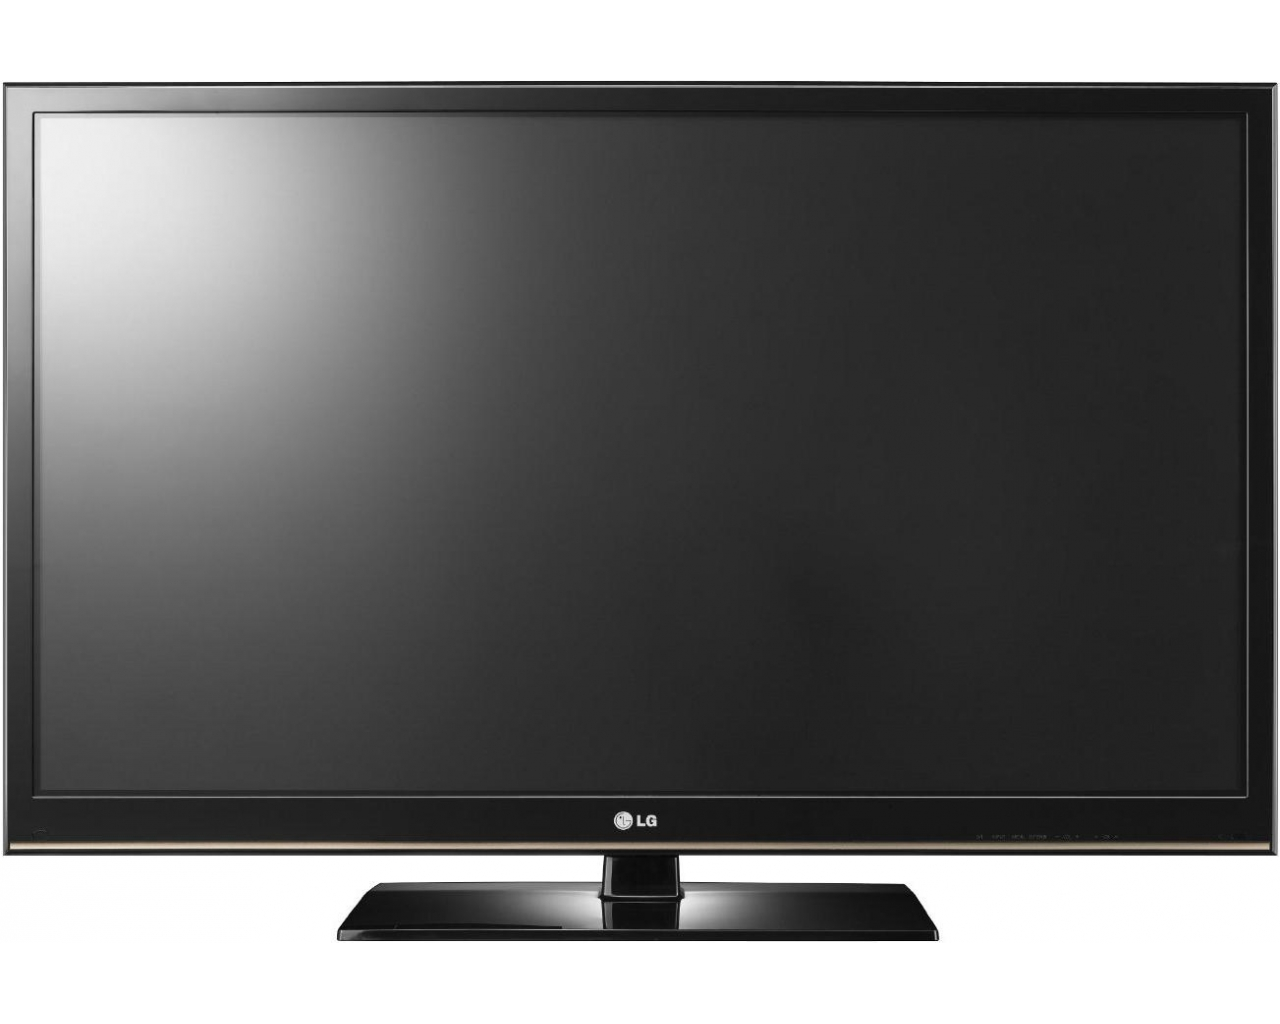 Tv PNG - 19703